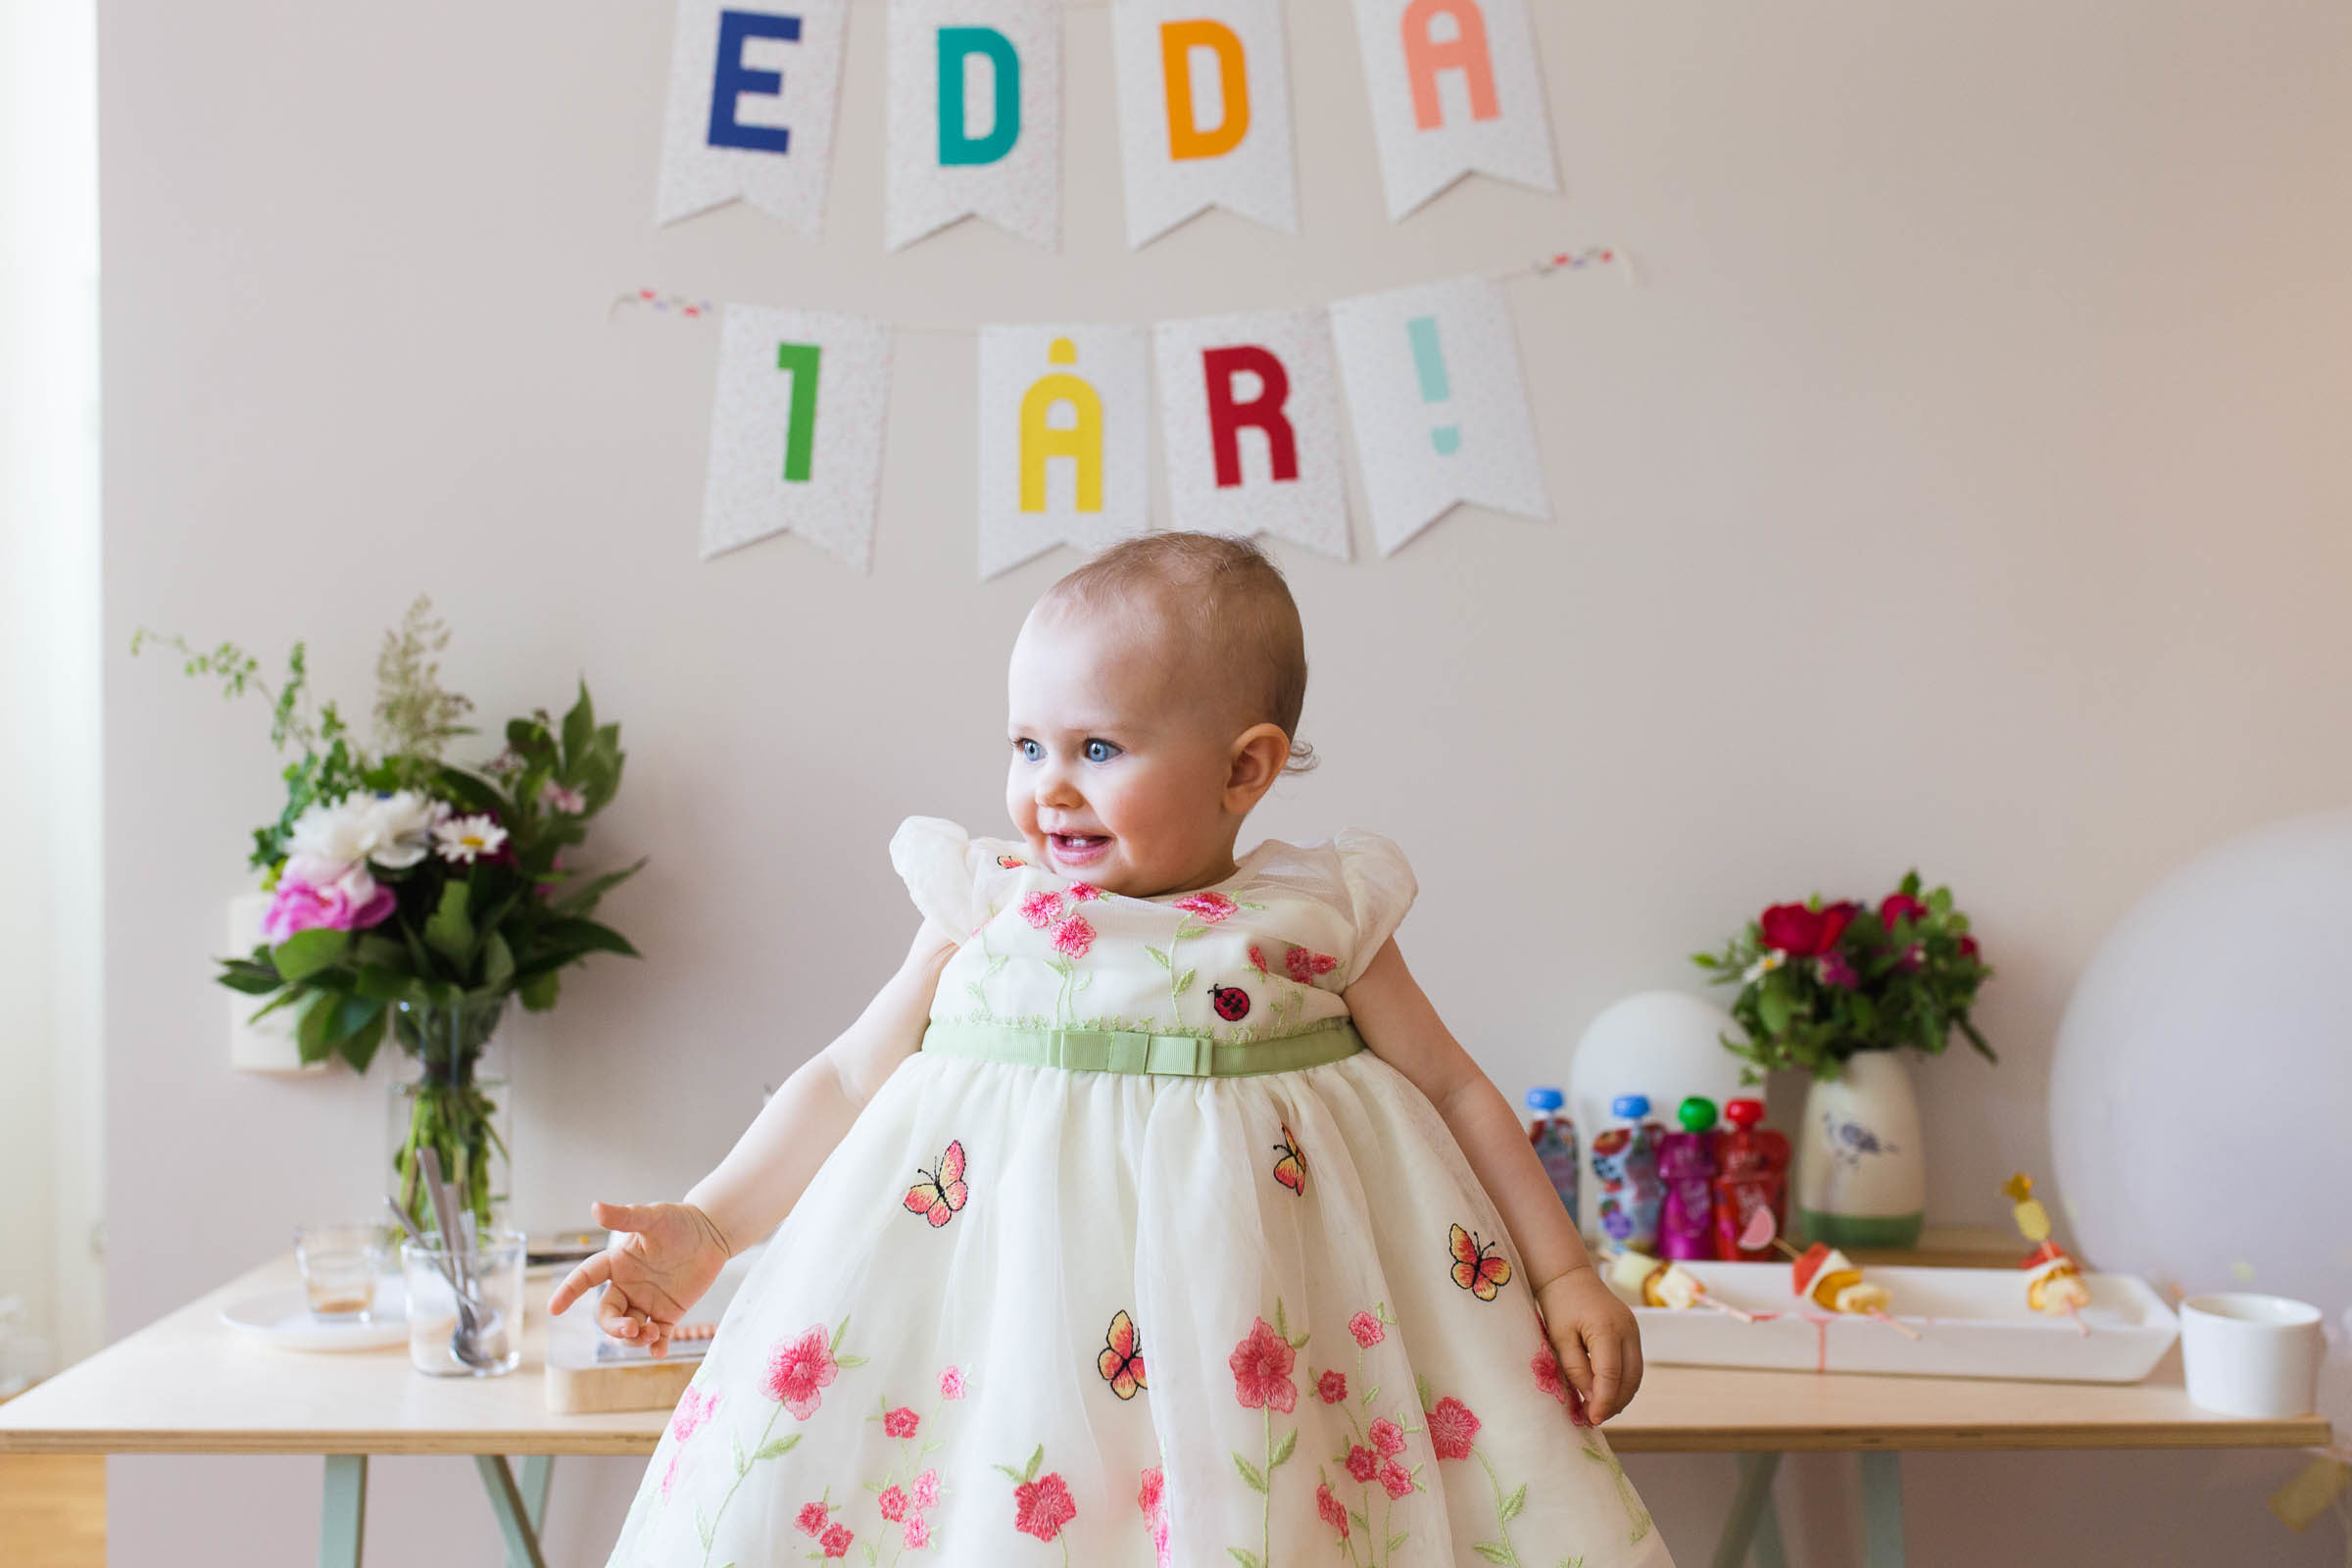 Edda 1 år